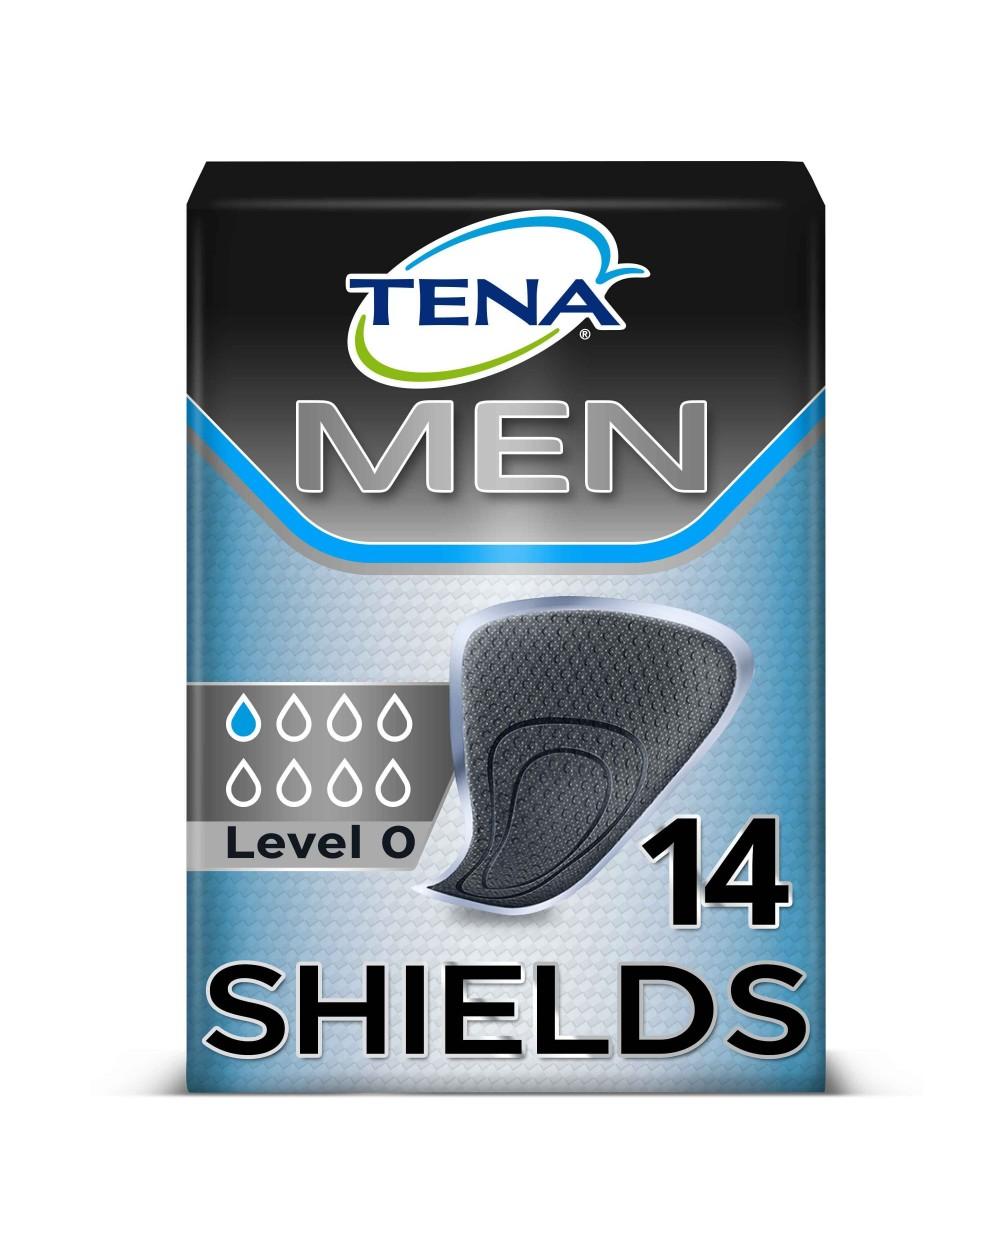 Tena Men Level 0 - 14 protections